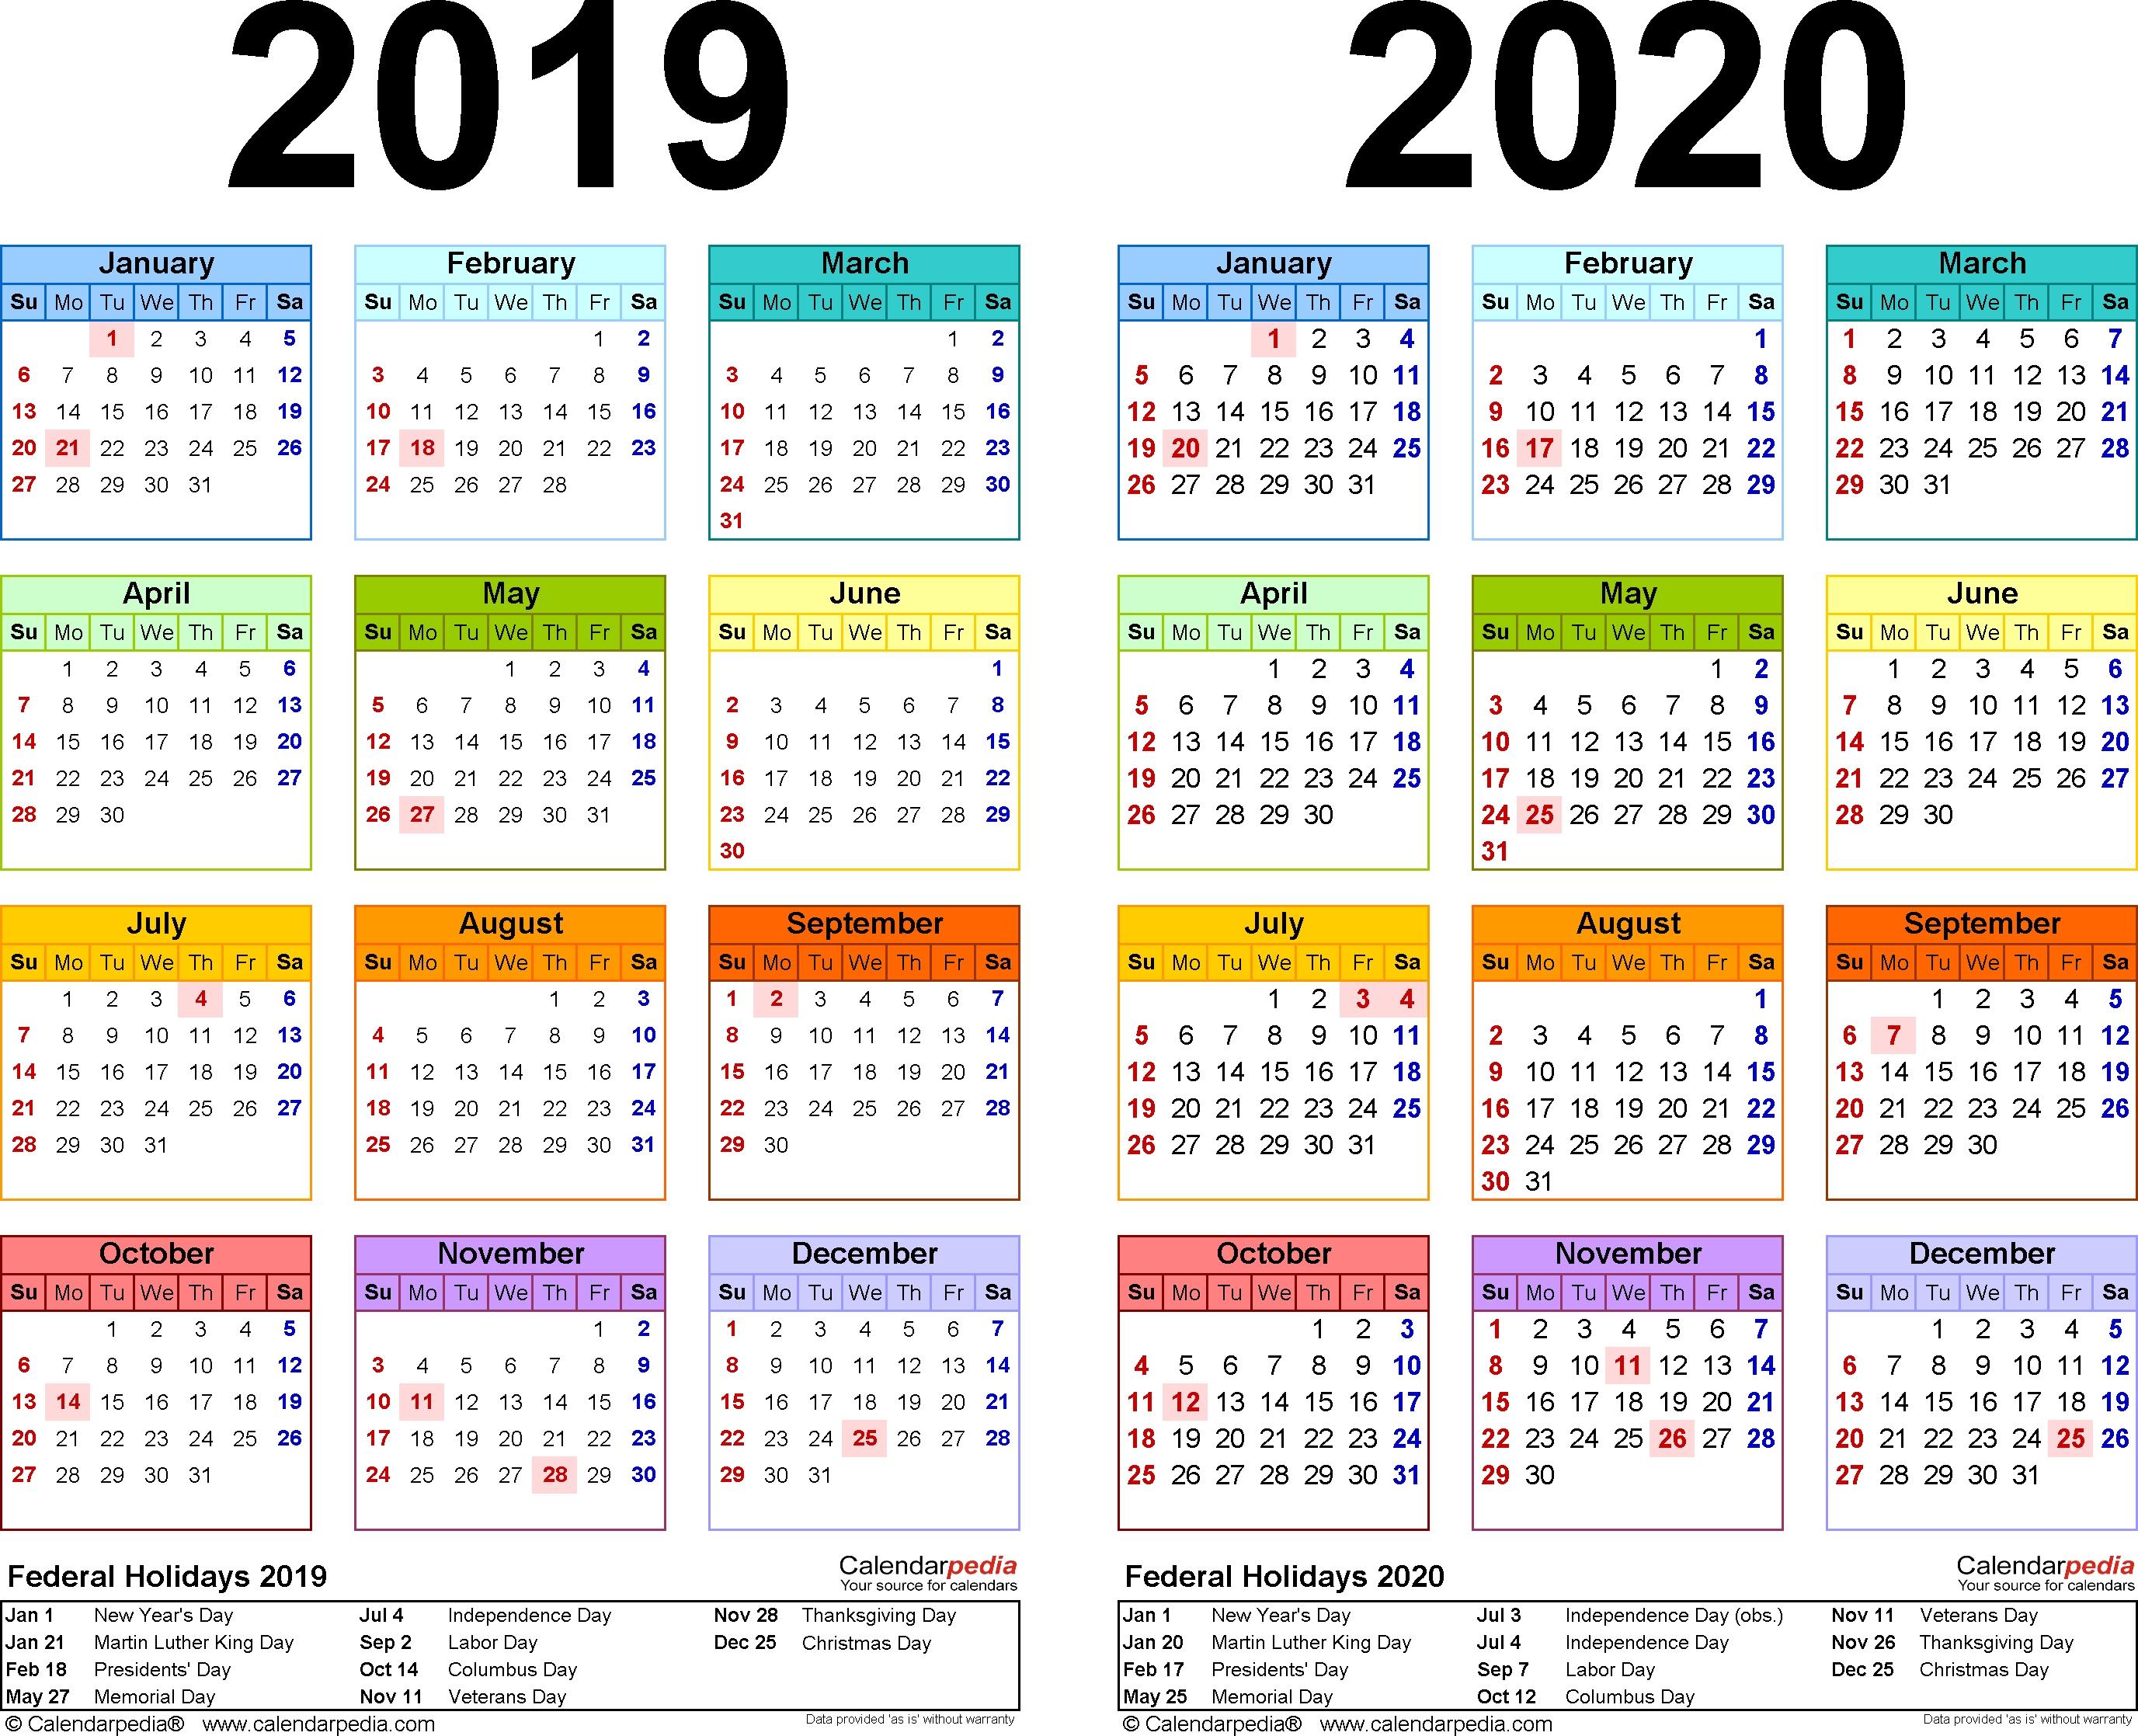 2019-2020 Calendar – Free Printable Two-Year Pdf Calendars 2020 Calendar 2019 Indesign